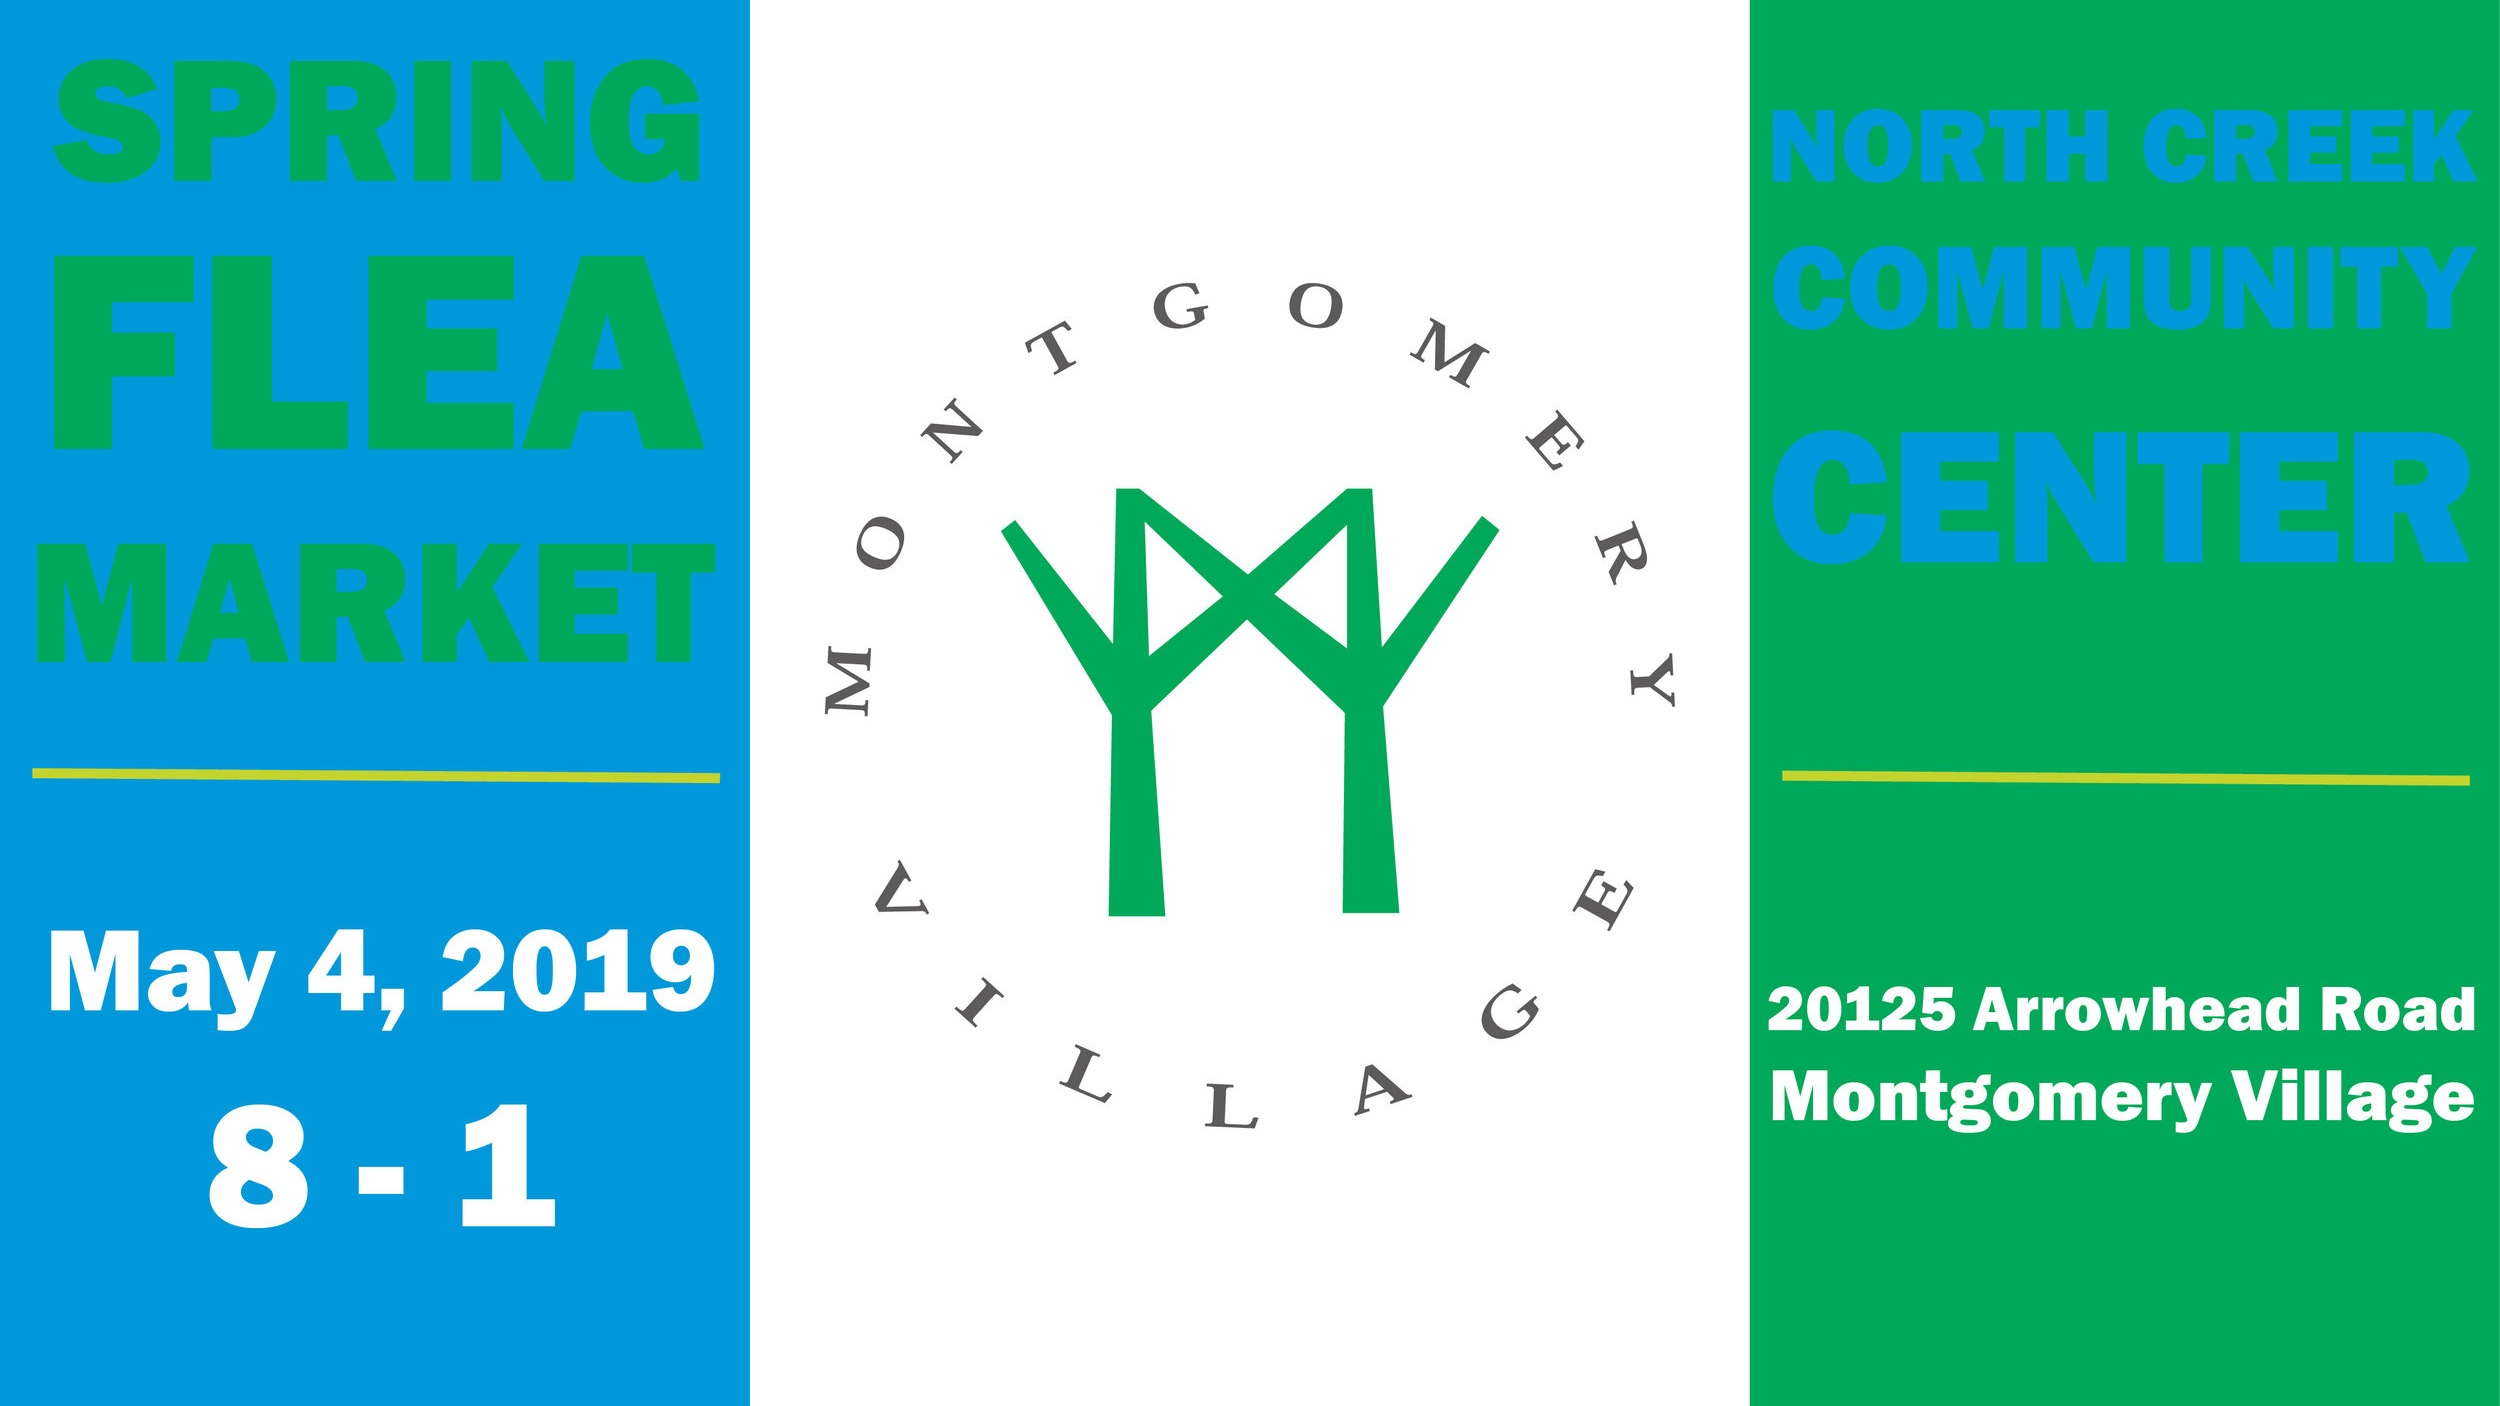 Montgomery_Village%2C_flea+market.jpg